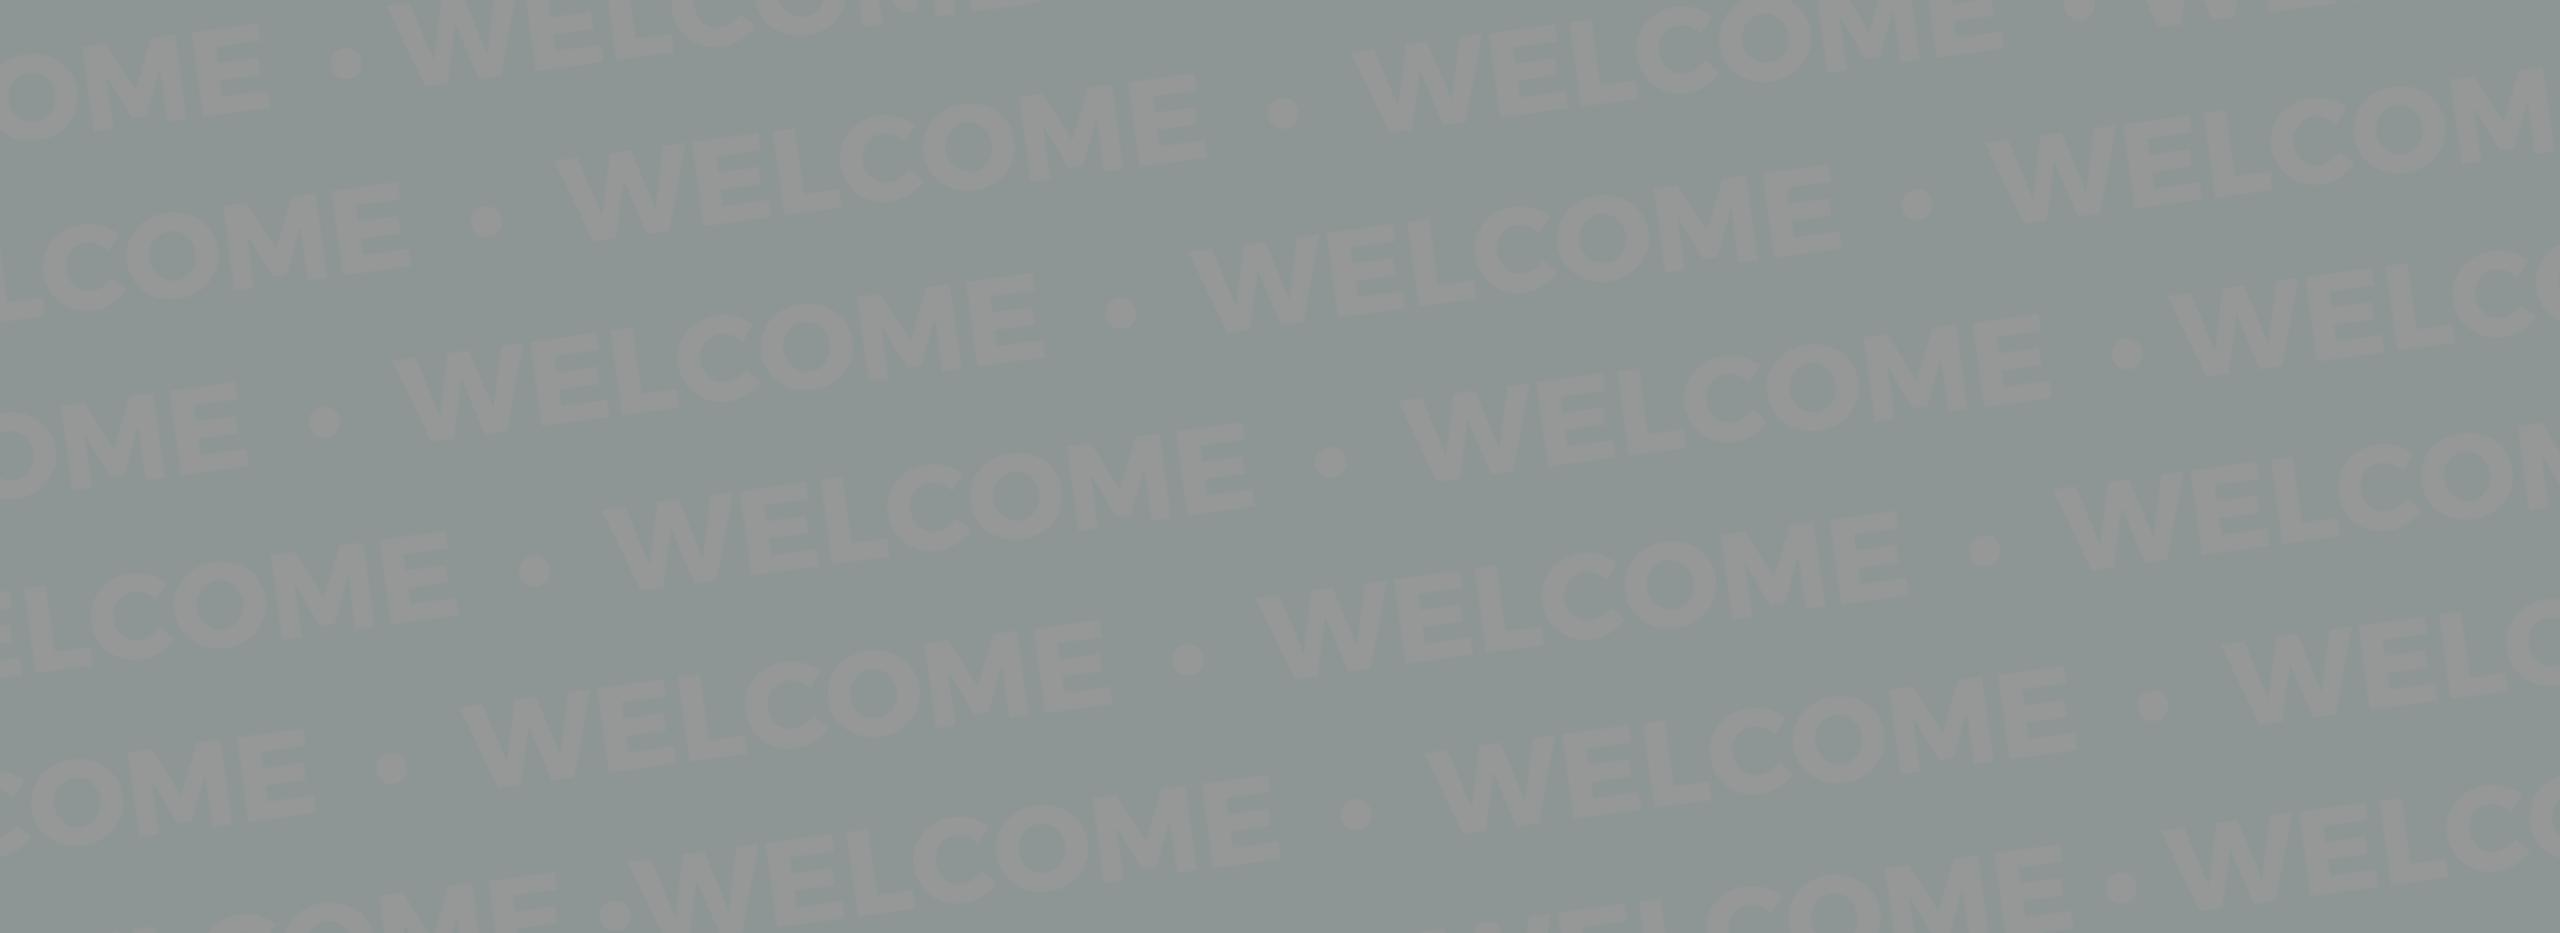 MRE | AP Welcomes New Agent Meredith Gurdak